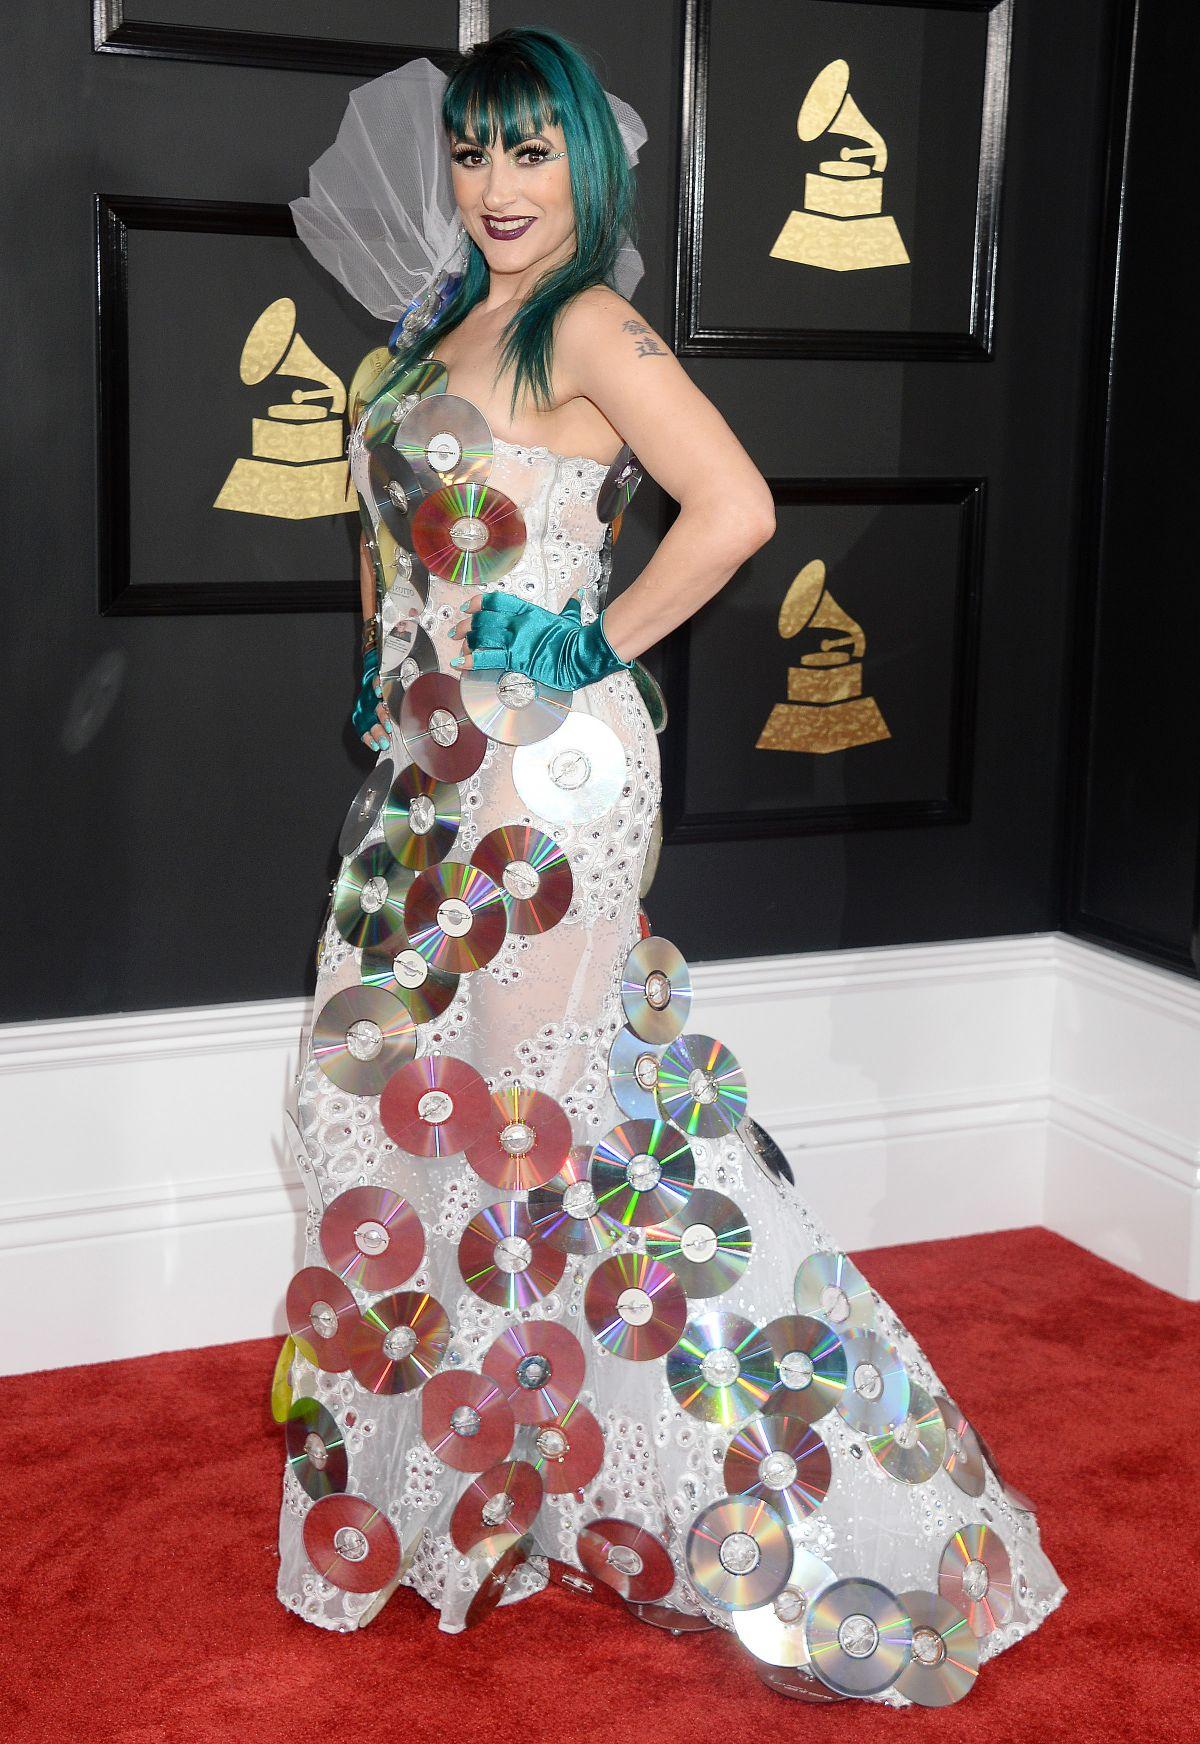 JACQUELINE VAN BIERK at 59th Annual Grammy Awards in Los Angeles 02/12/2017